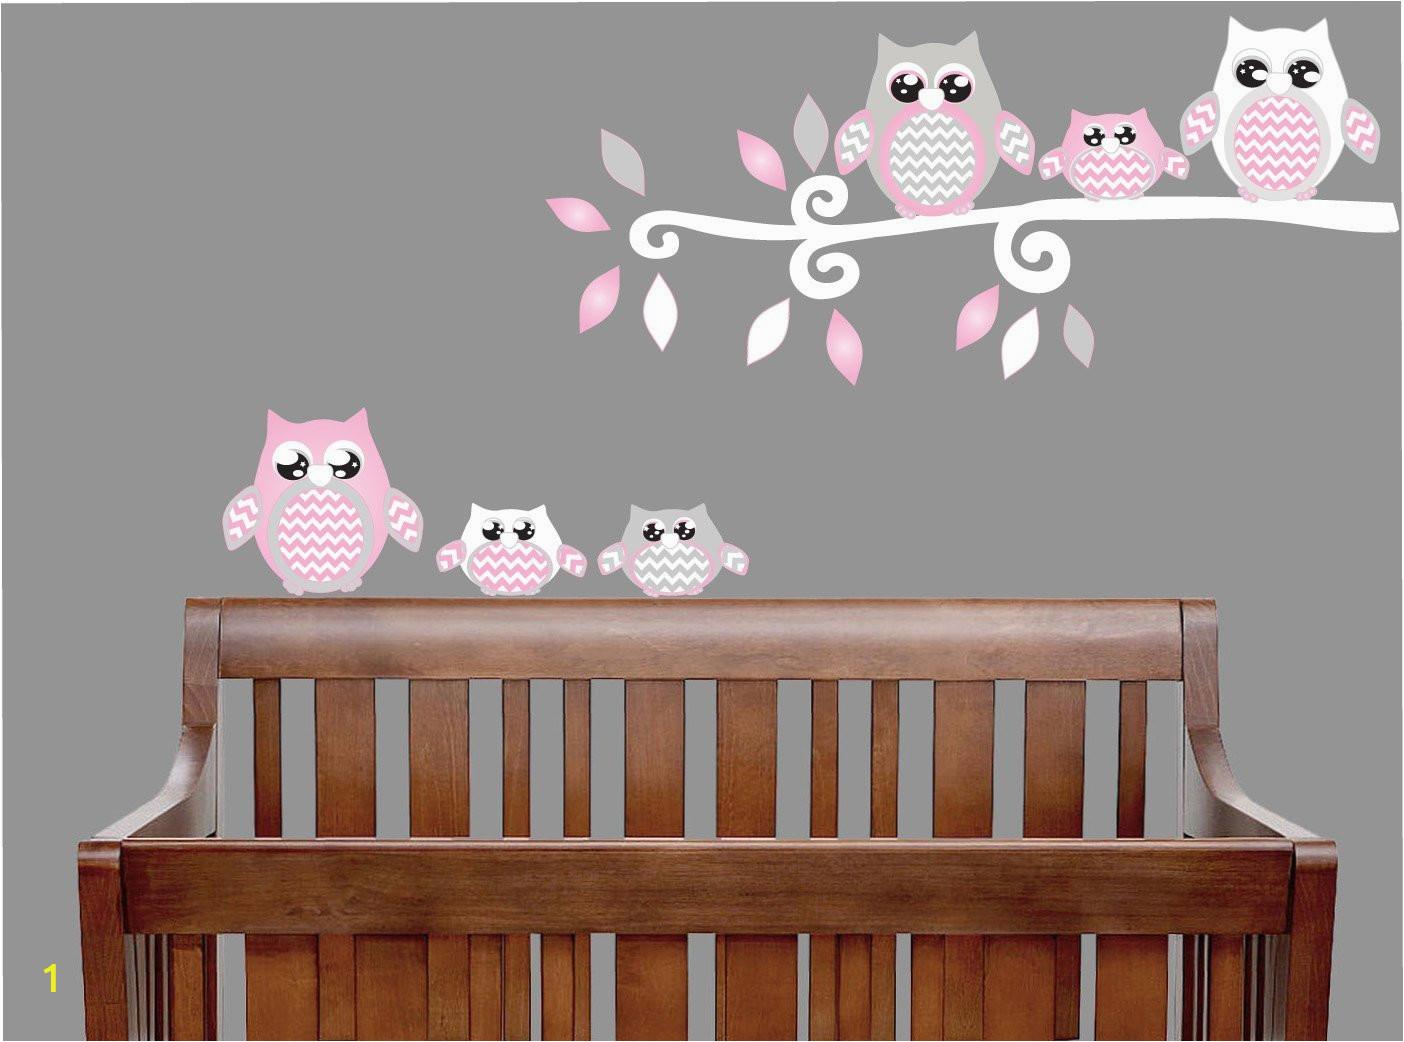 Pink Owl Wall Decals Owl Stickers Owl Nursery Wall Decor Grey and Pink Owl Wall Decals B014OD63EK